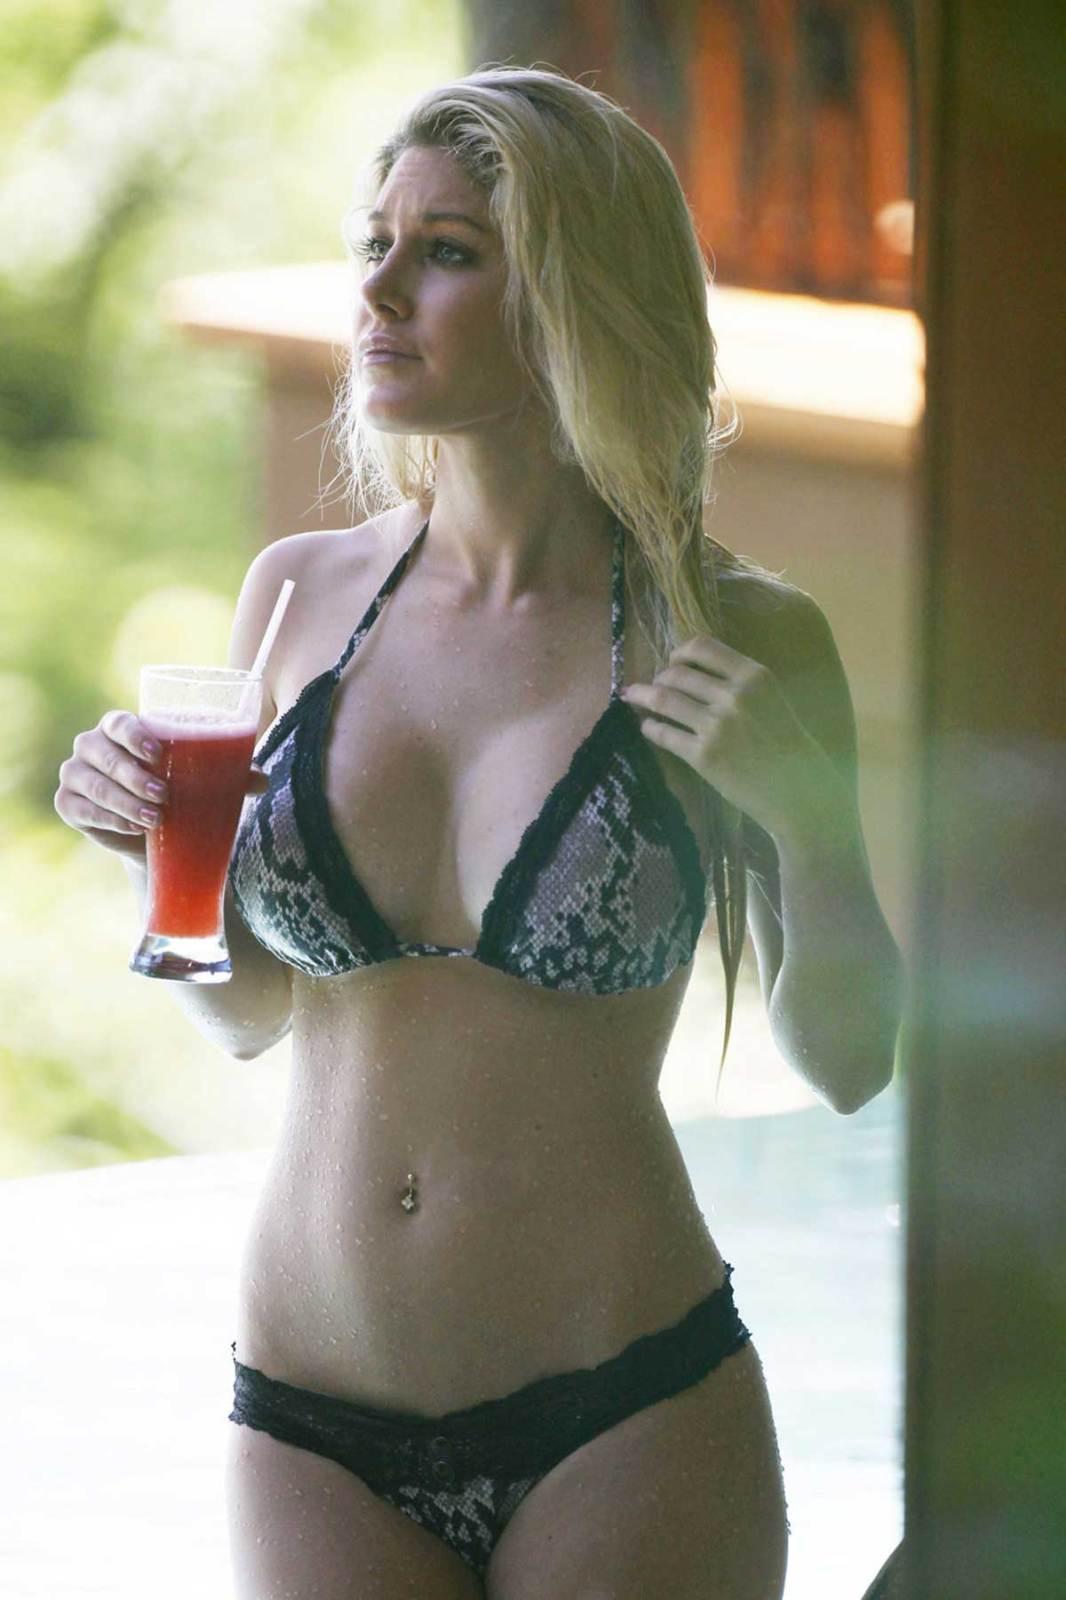 Heidi Montag Bikini Body photo